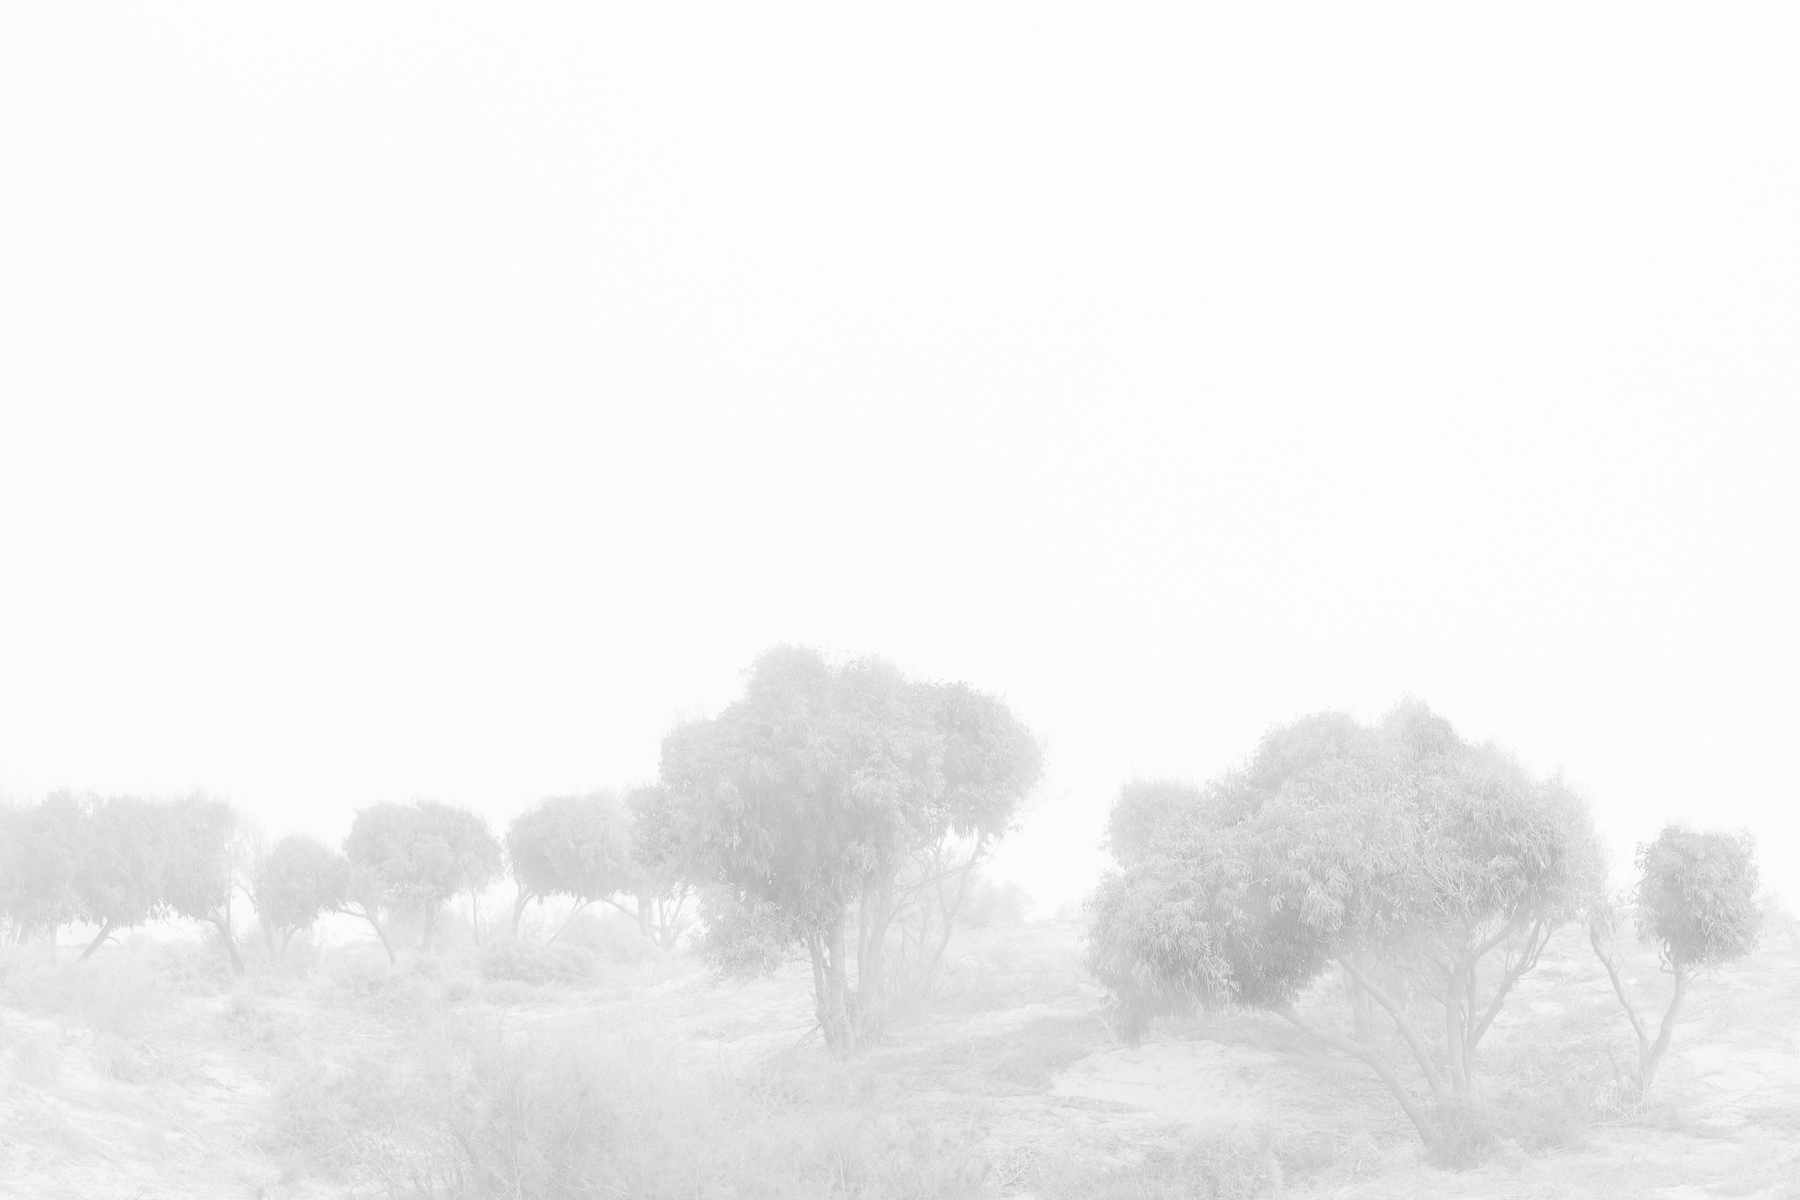 white-shadow stephane louesdon @2018